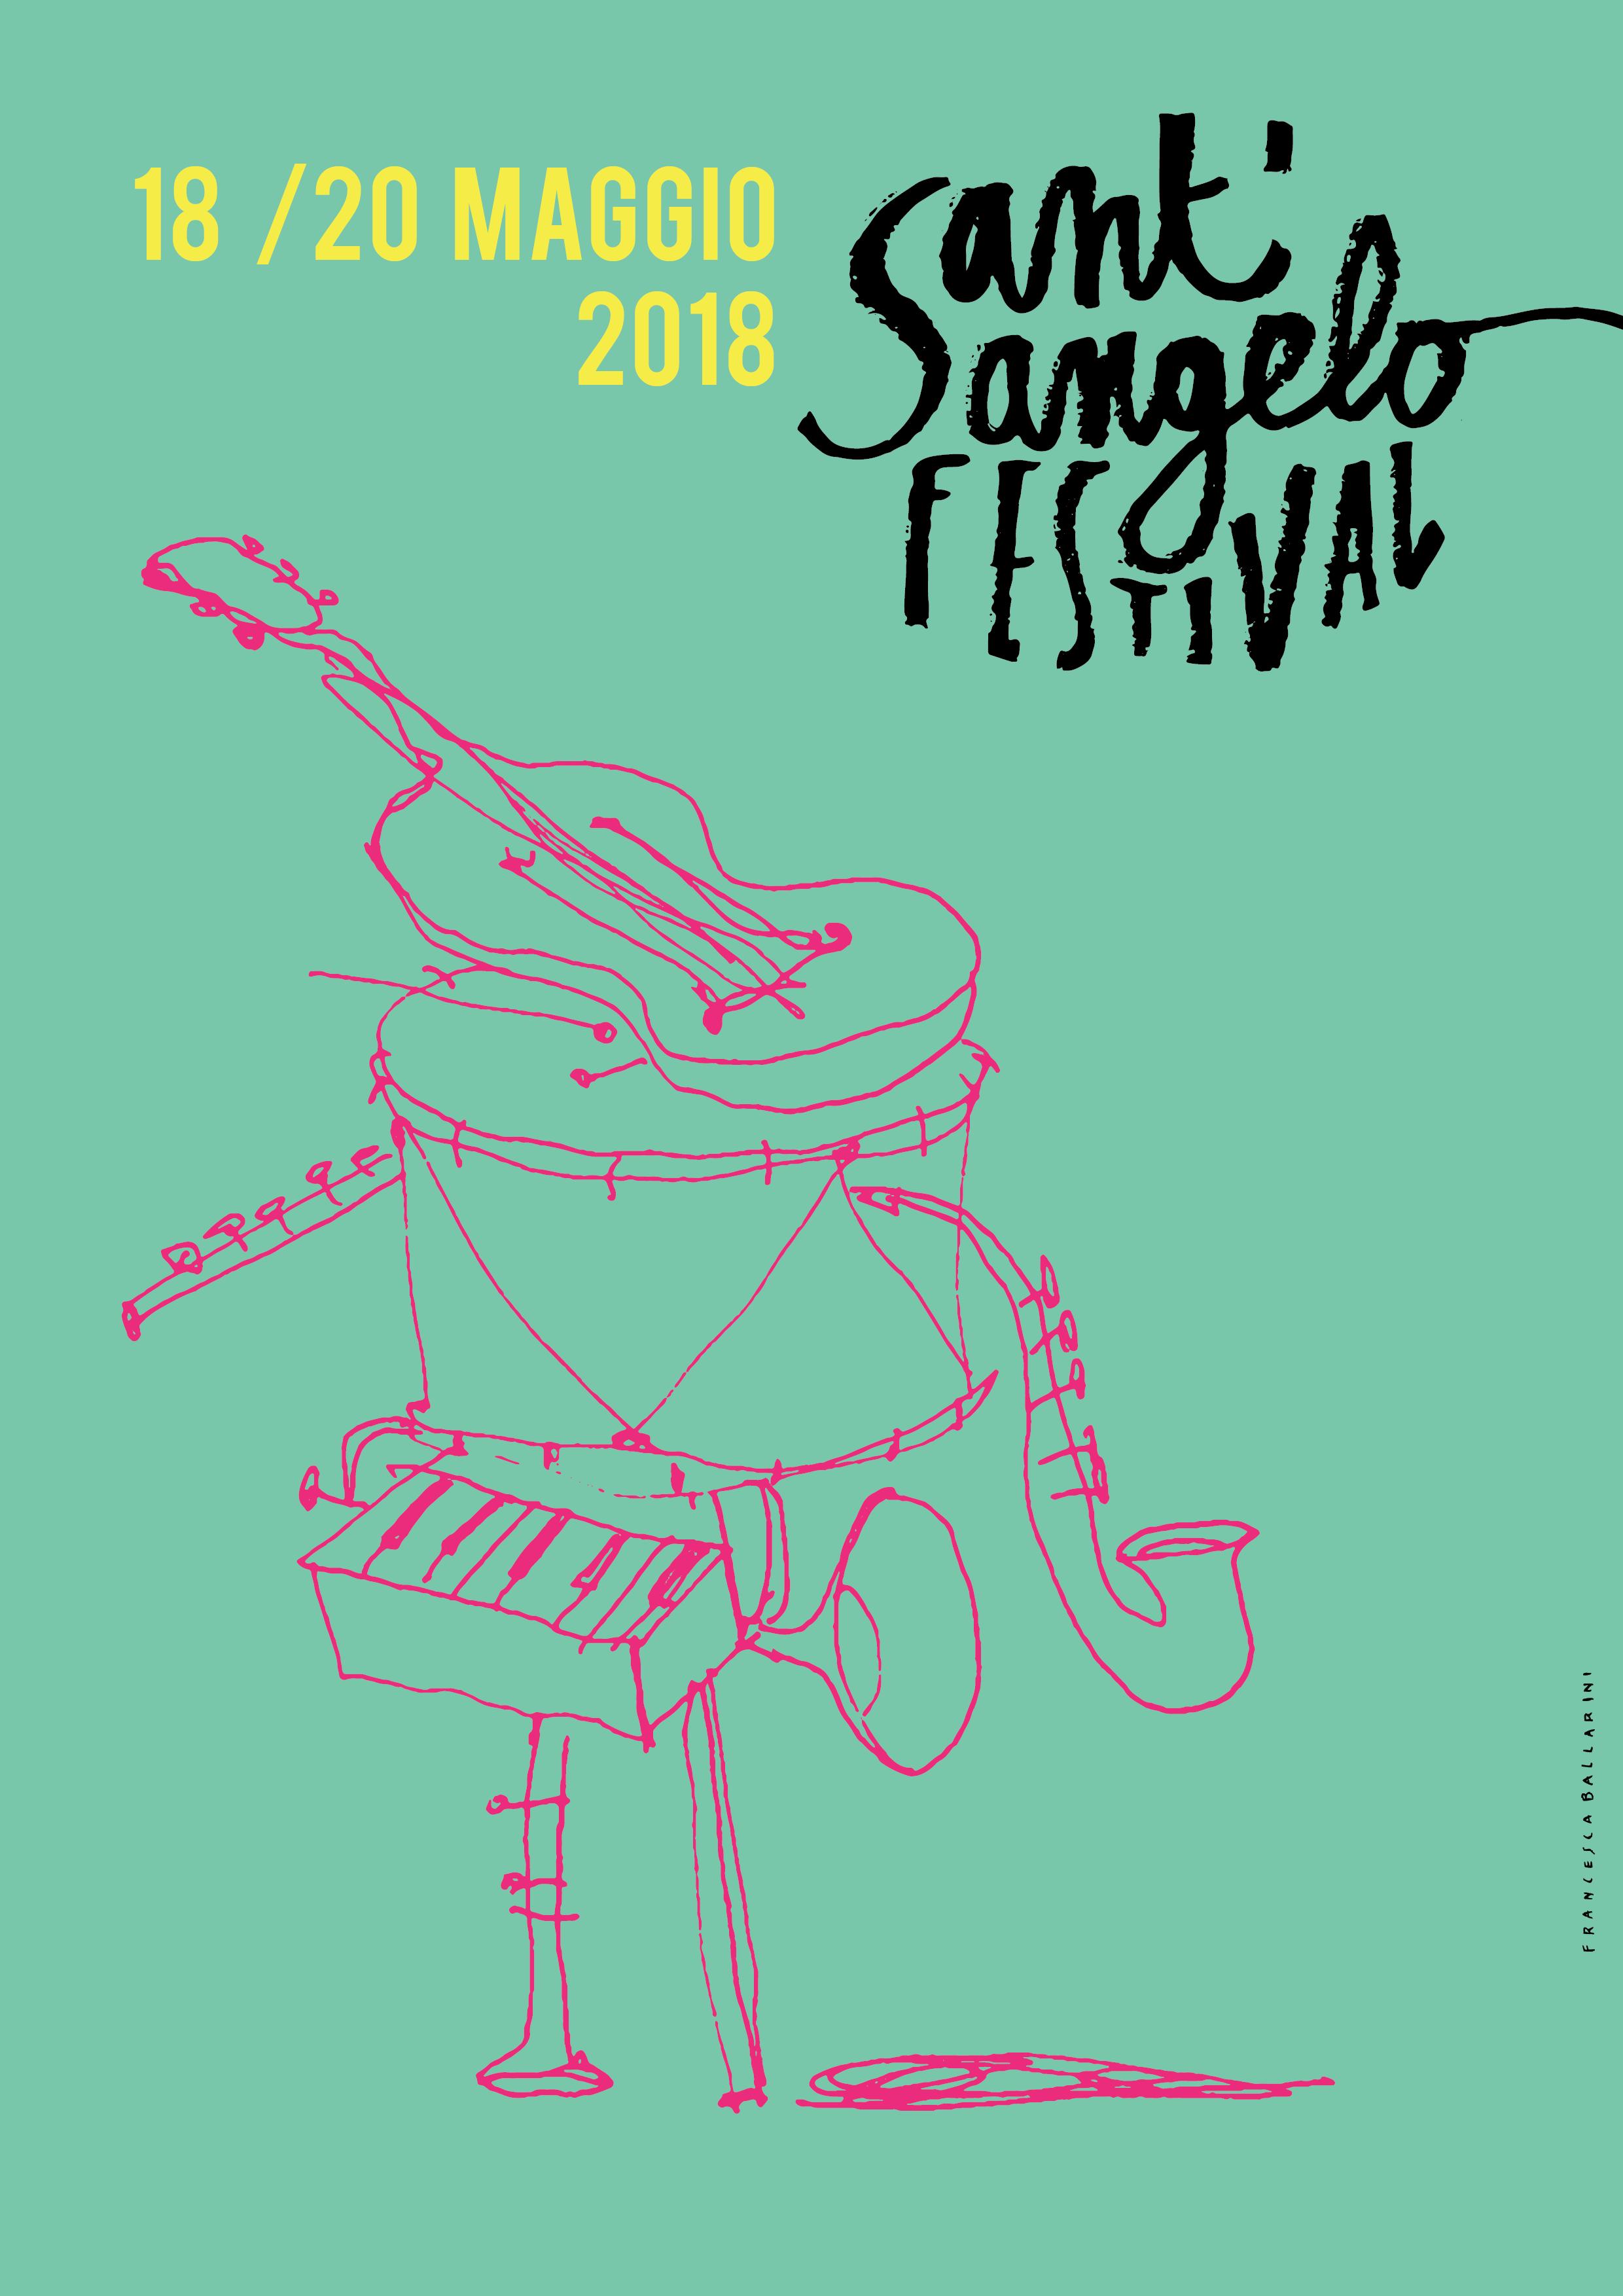 http://santangelofestival.it/wp-content/uploads/2018/03/sequenza_Vettoriale_Santangelo-16.png